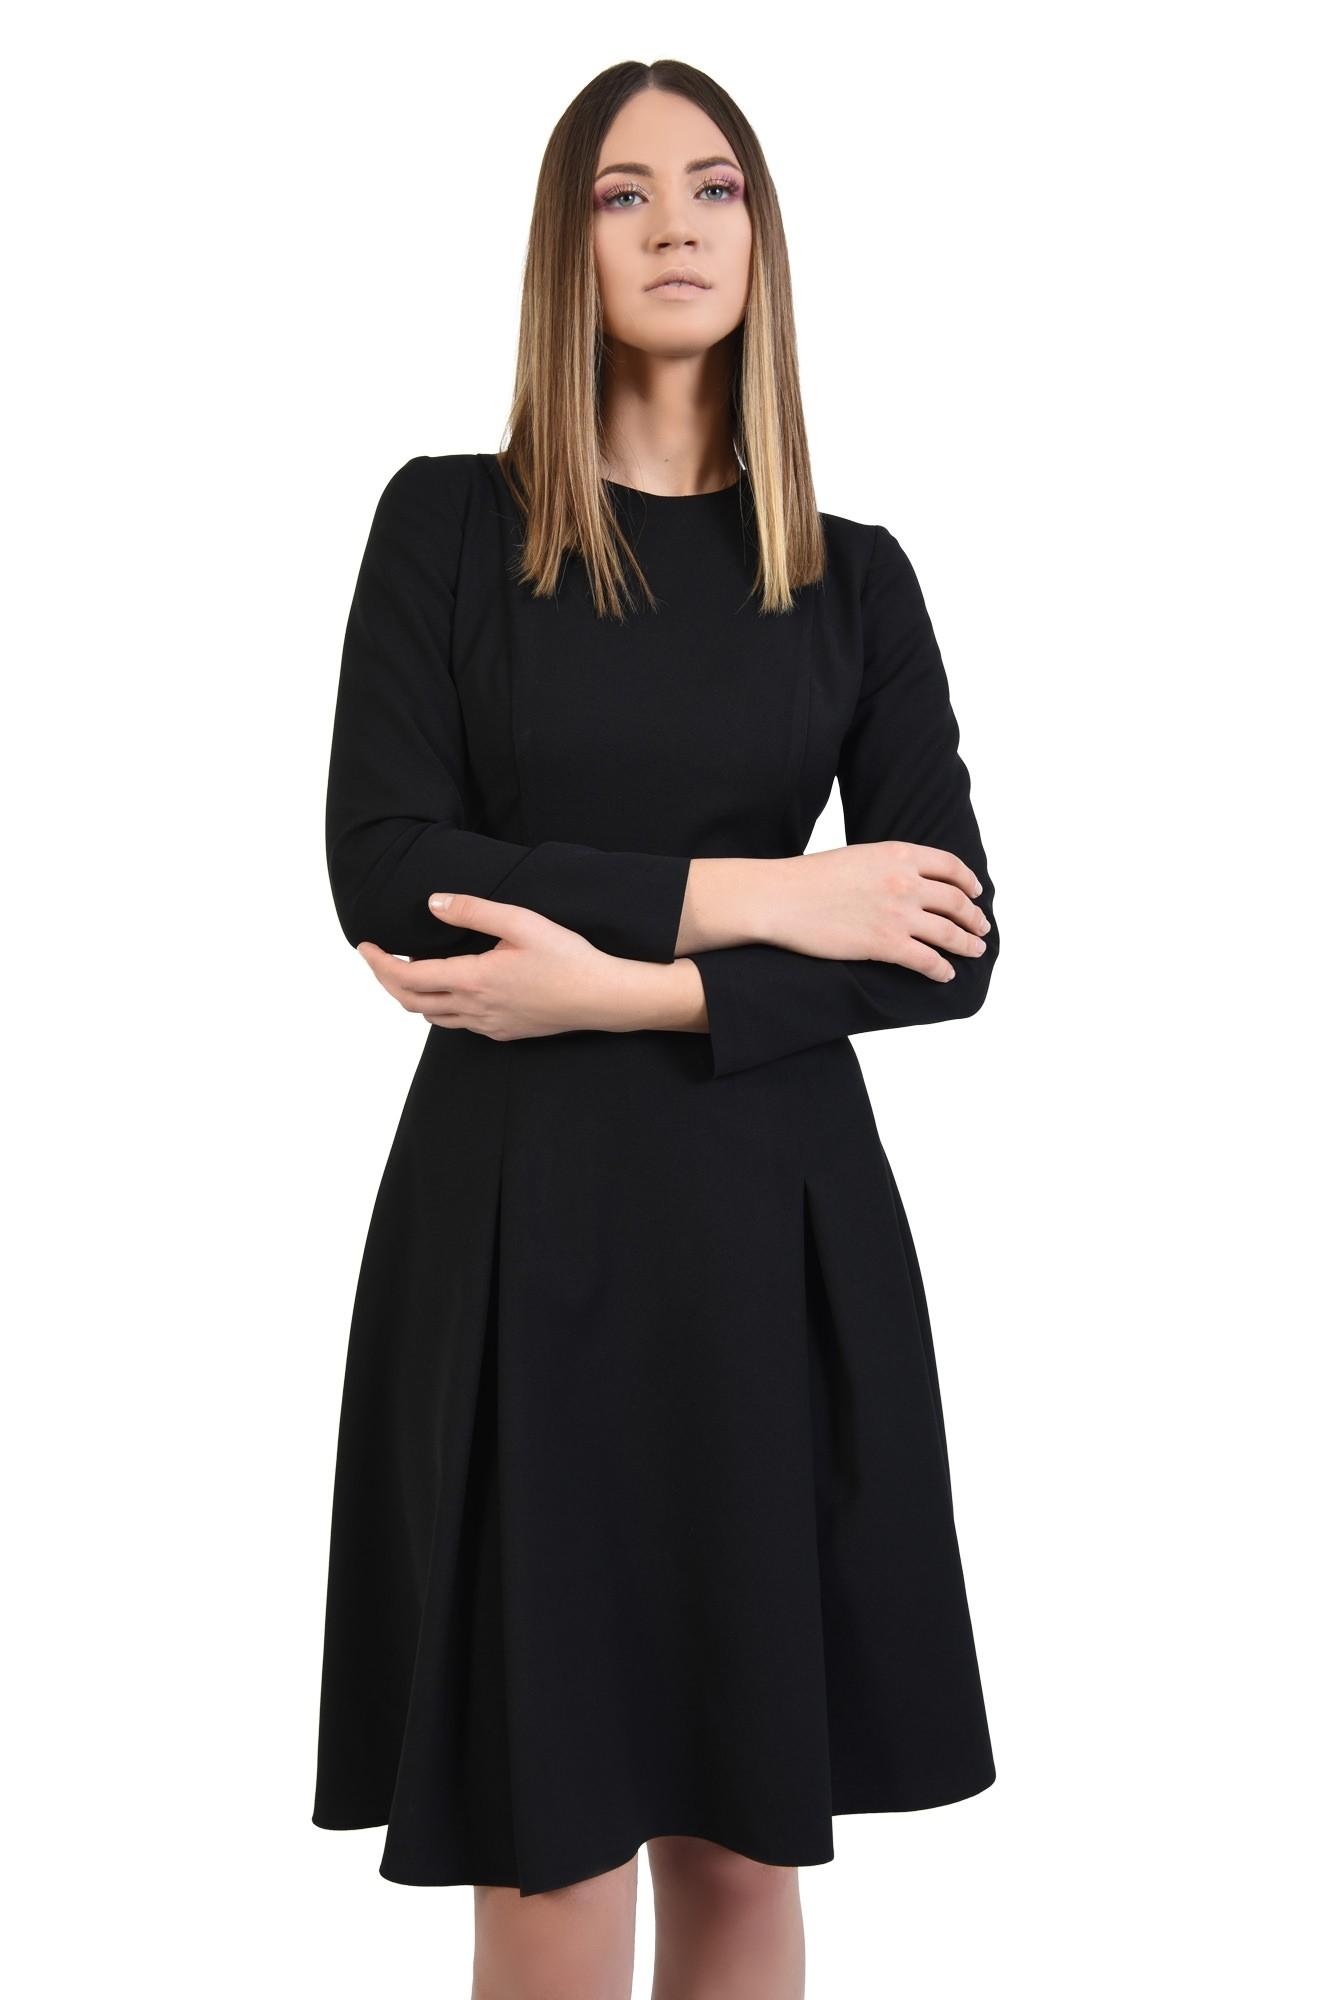 0 - rochie neagra, midi, din crep, maneci lungi ajustate